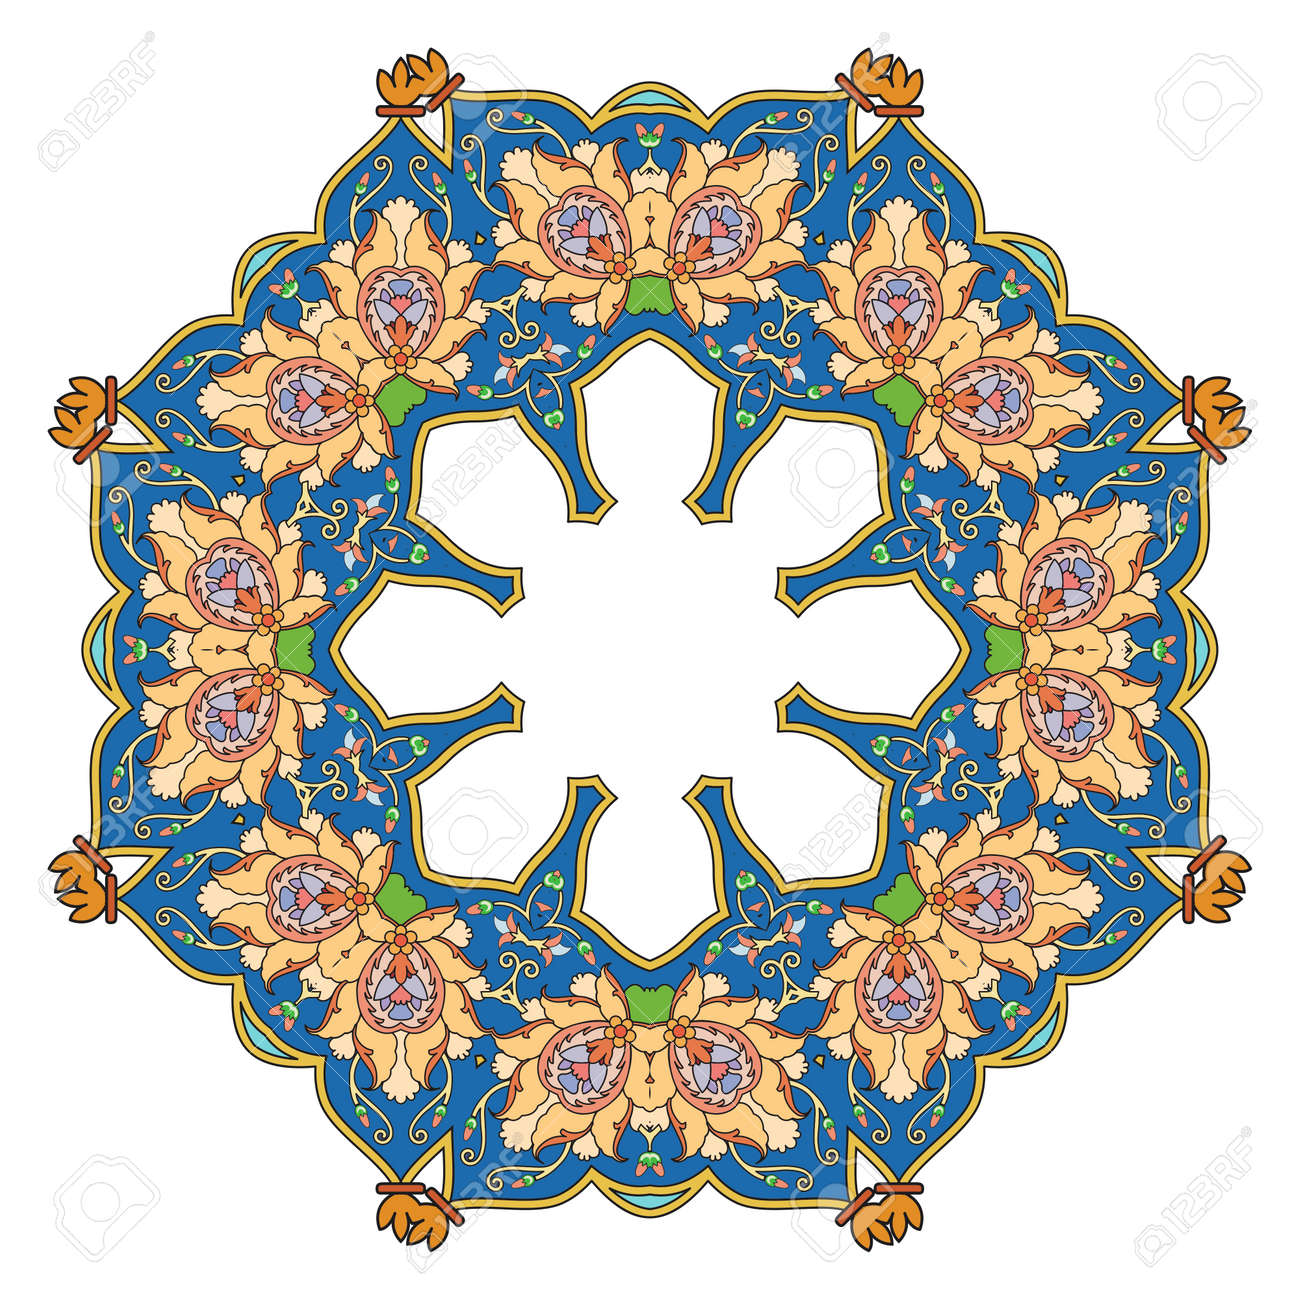 Round Pattern Mandala. Abstract Design Of Persian- Islamic-Turkish ...